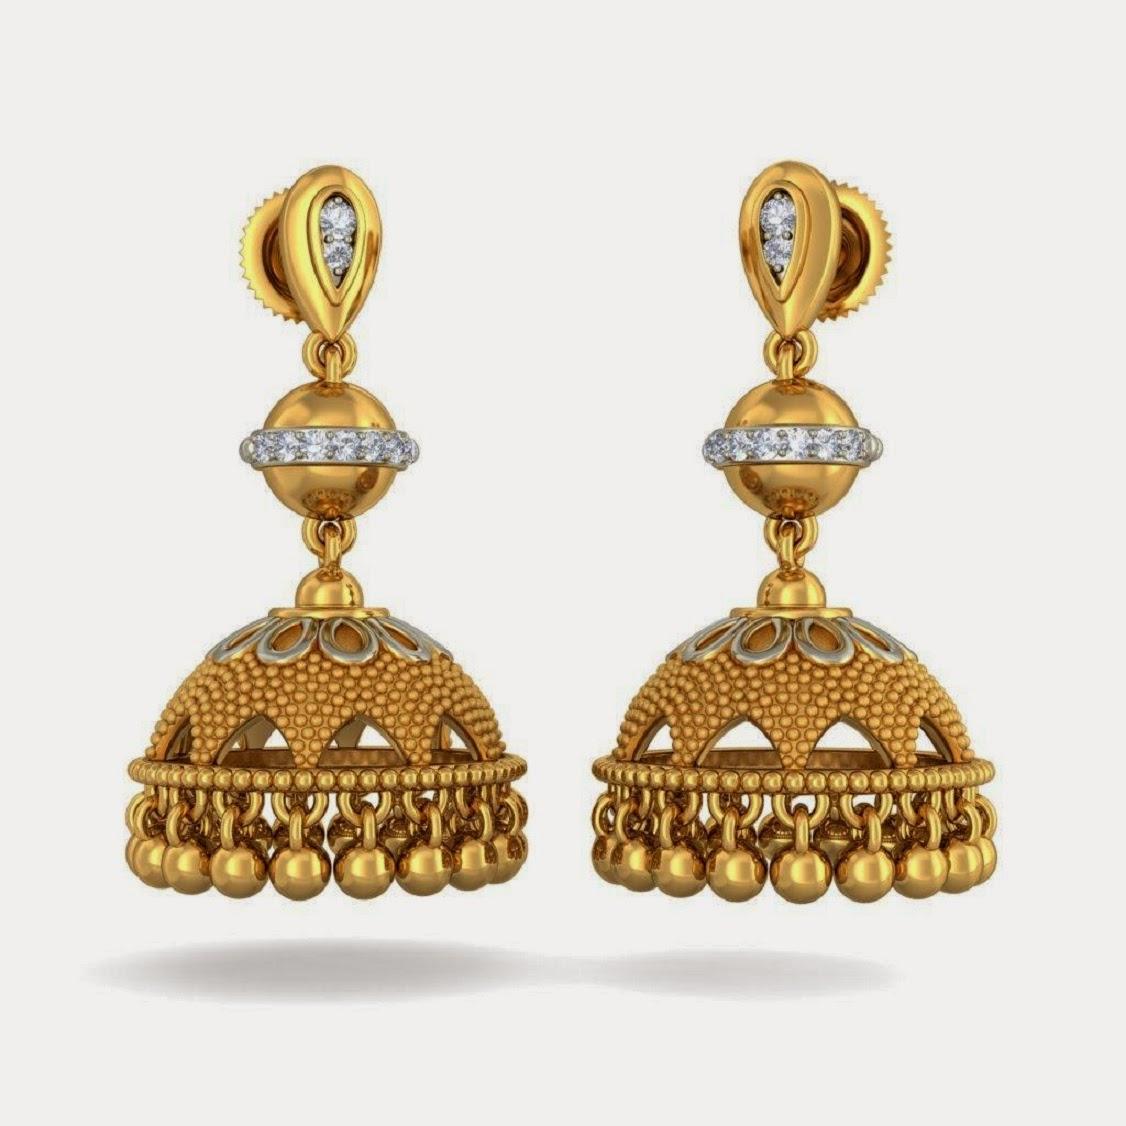 Latest Gold Jhumka Earring Designs Hd Wallpaper  All 4u. Pachalu Beads. Stone Beads Beads. Crochet Thread Beads. Cherokee Beads. Antic Beads. Stylish Beads. Jewelry Beads. Bar Beads